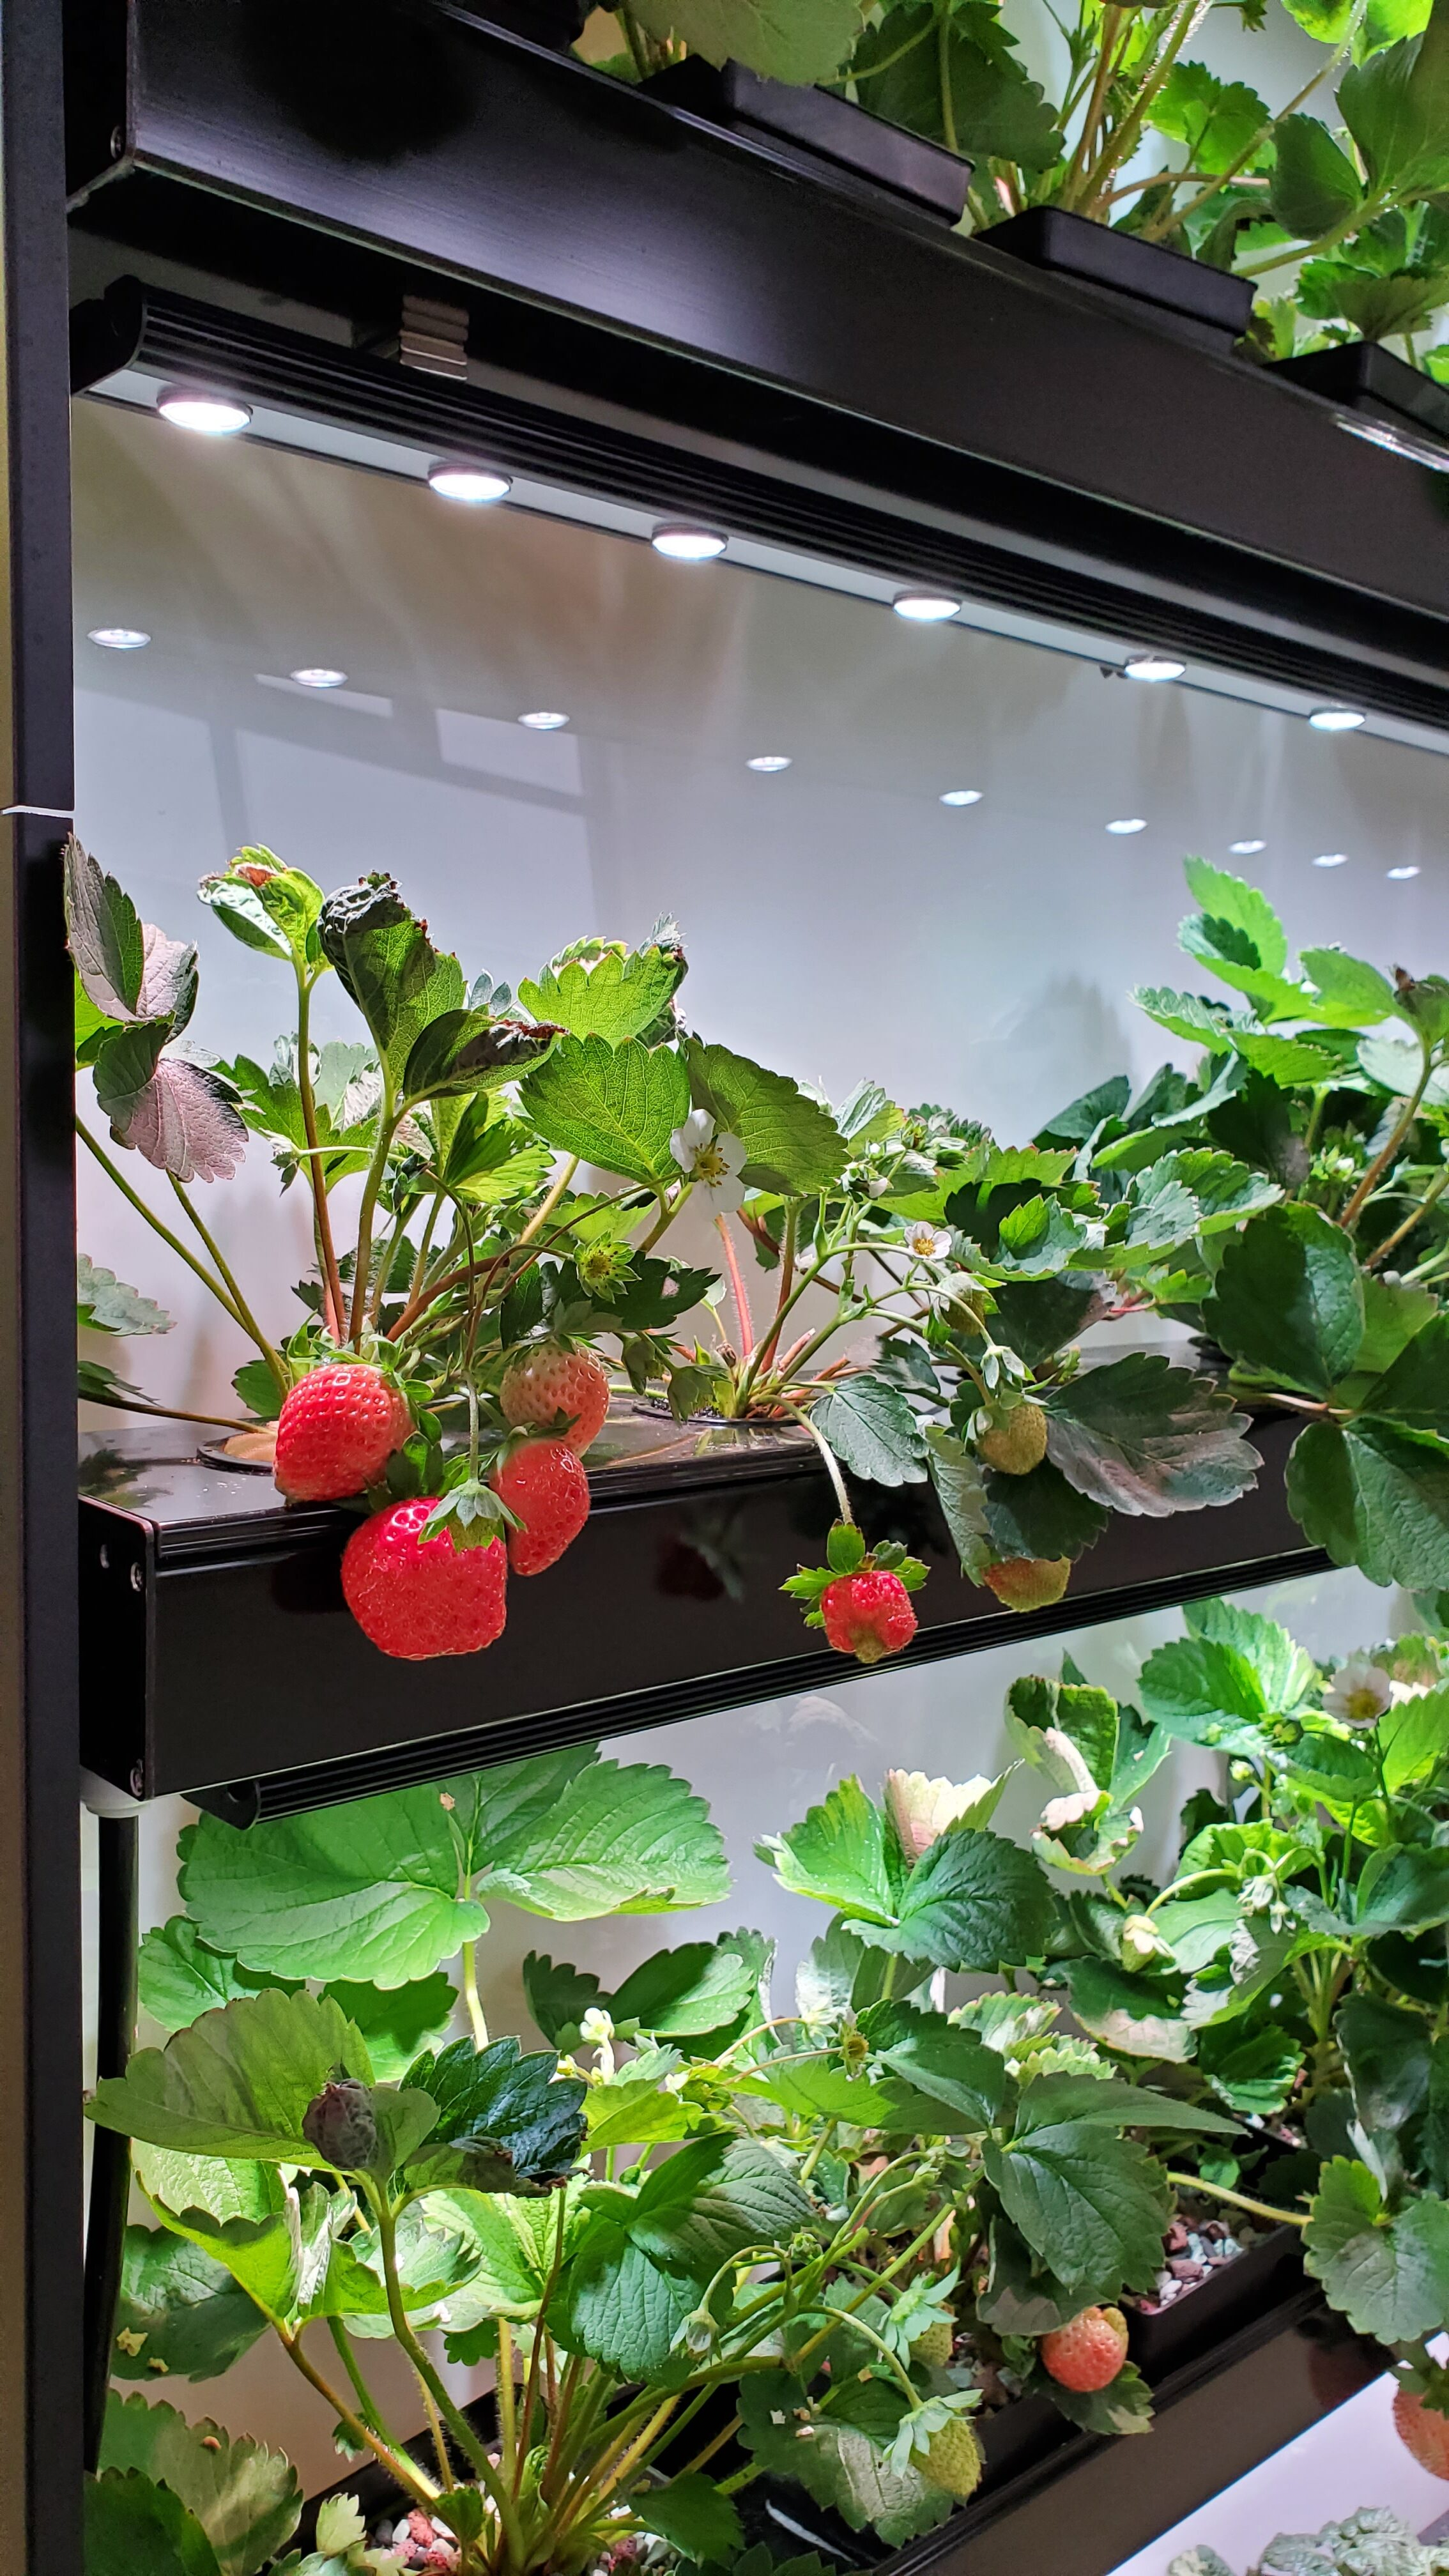 Furegreen Strawberry plant